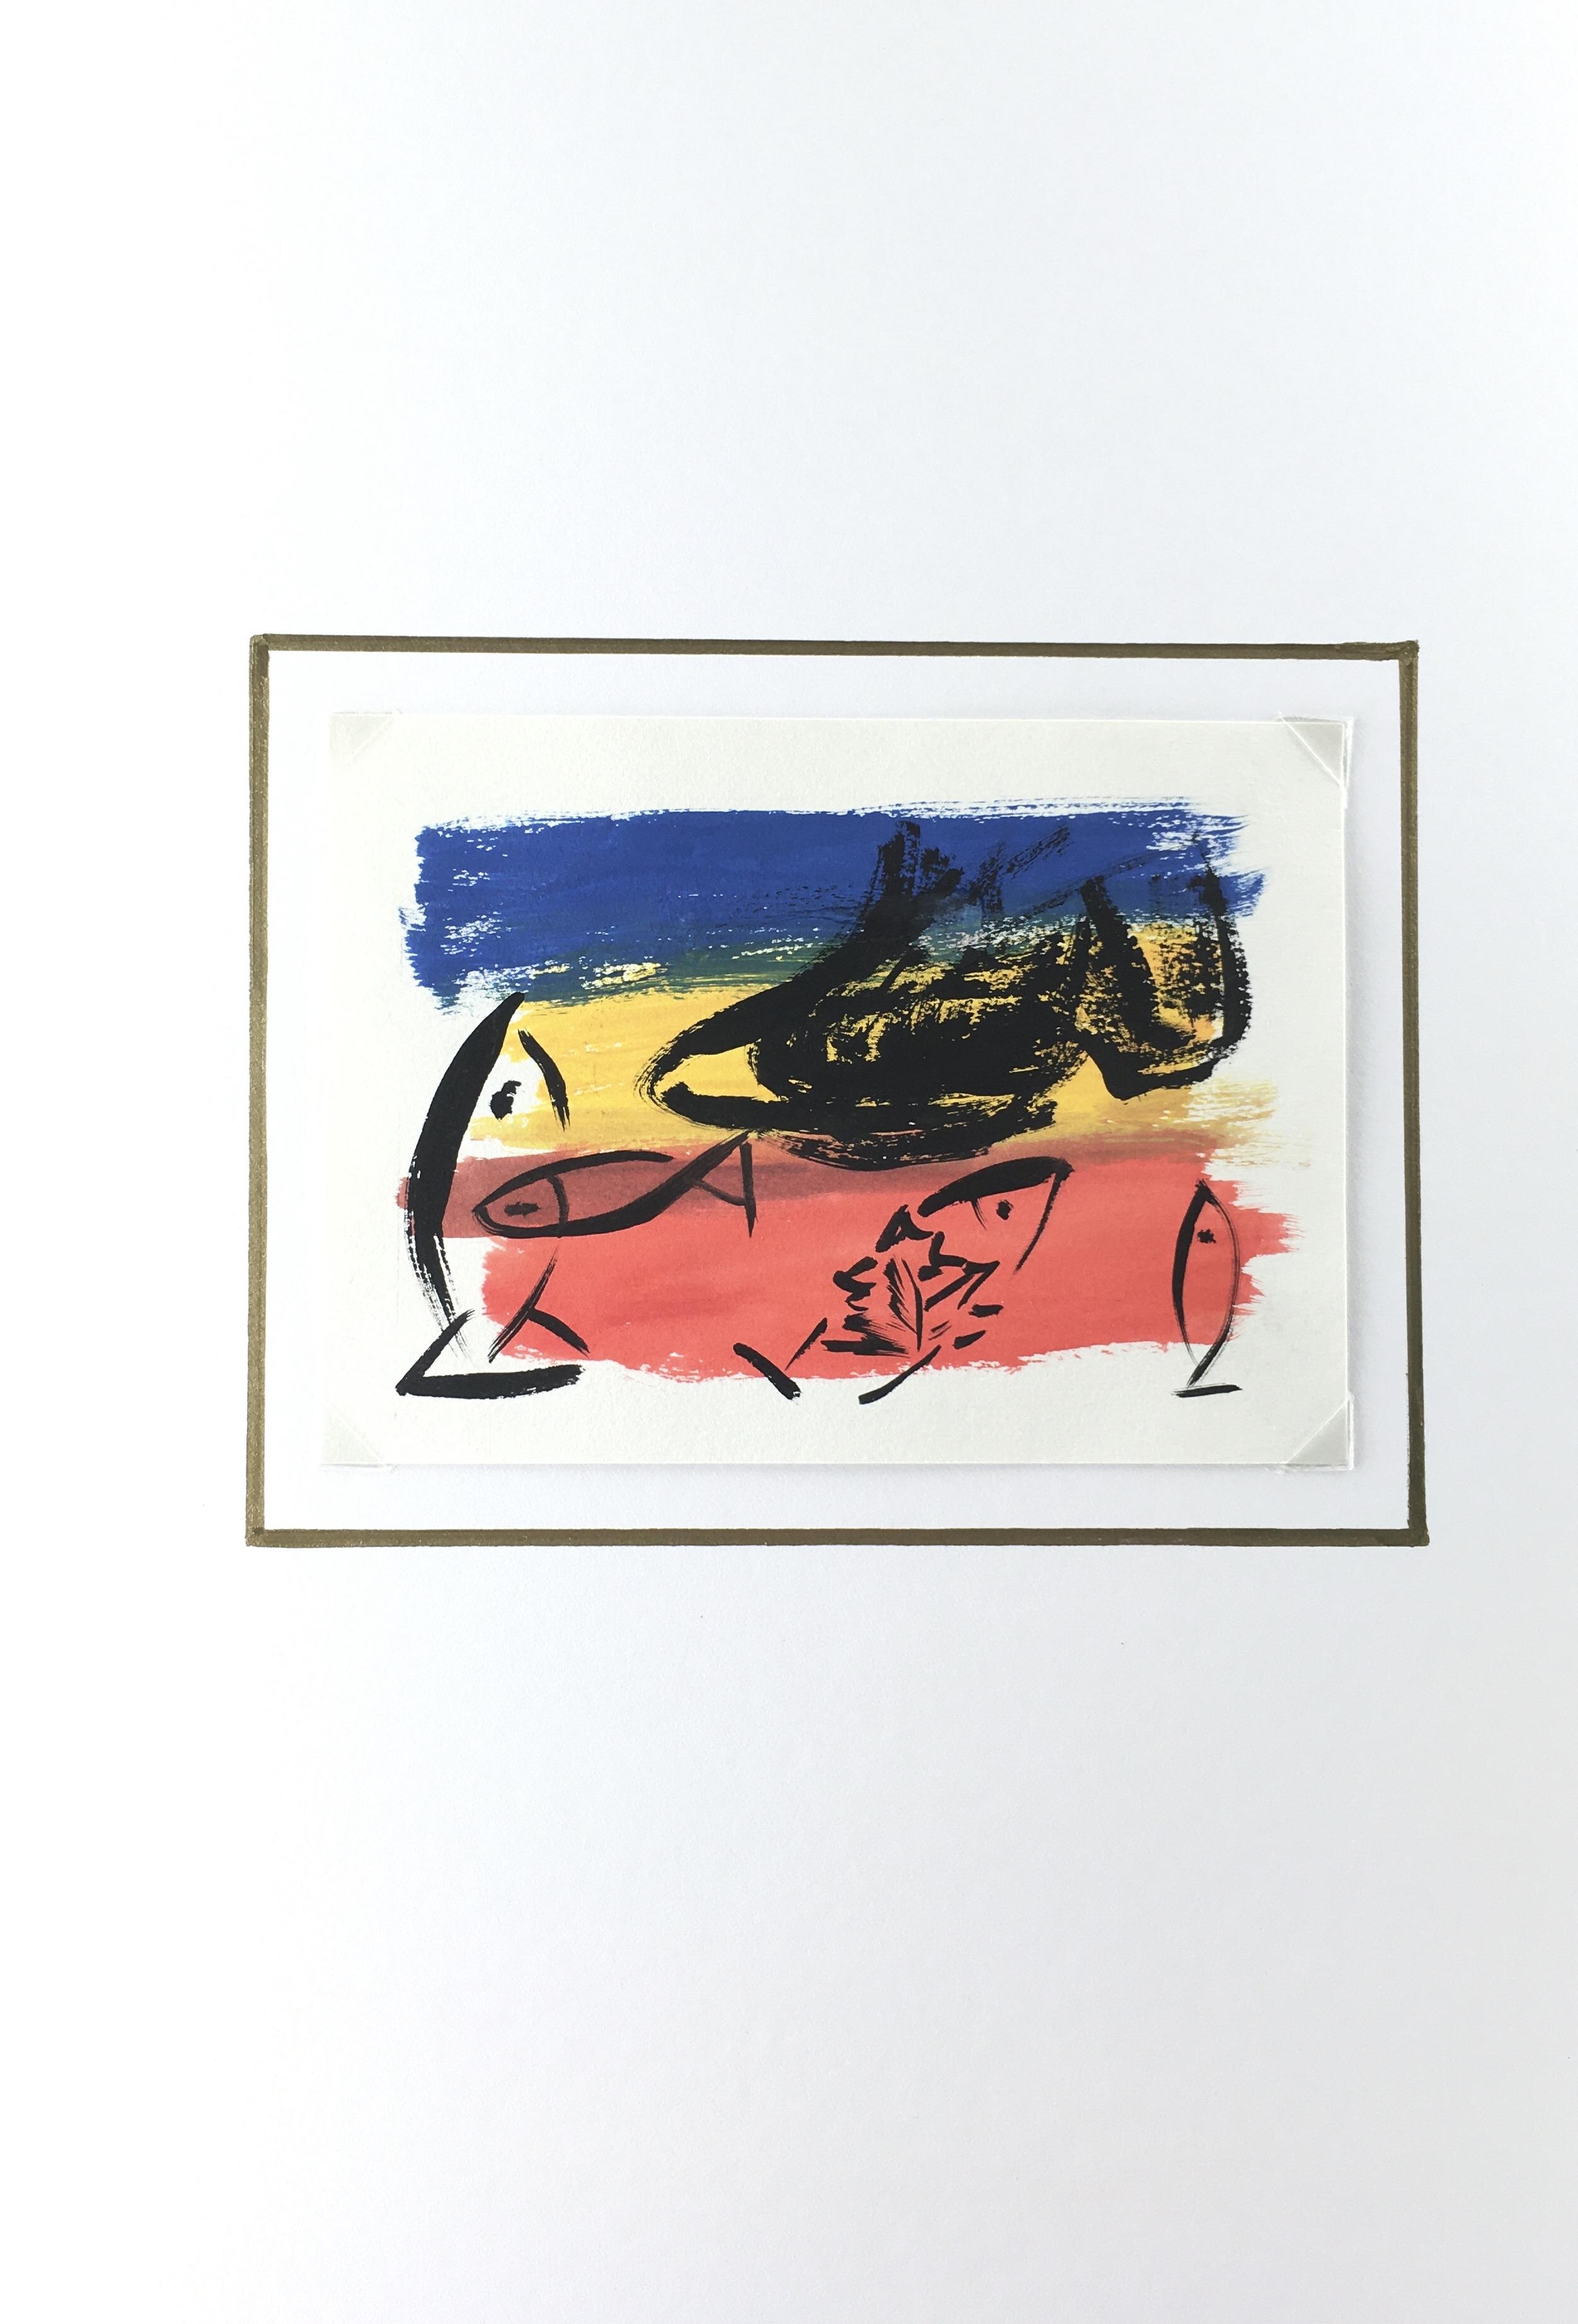 Animals Fish & Fishing Original Art - Tricolored Fish, 2000